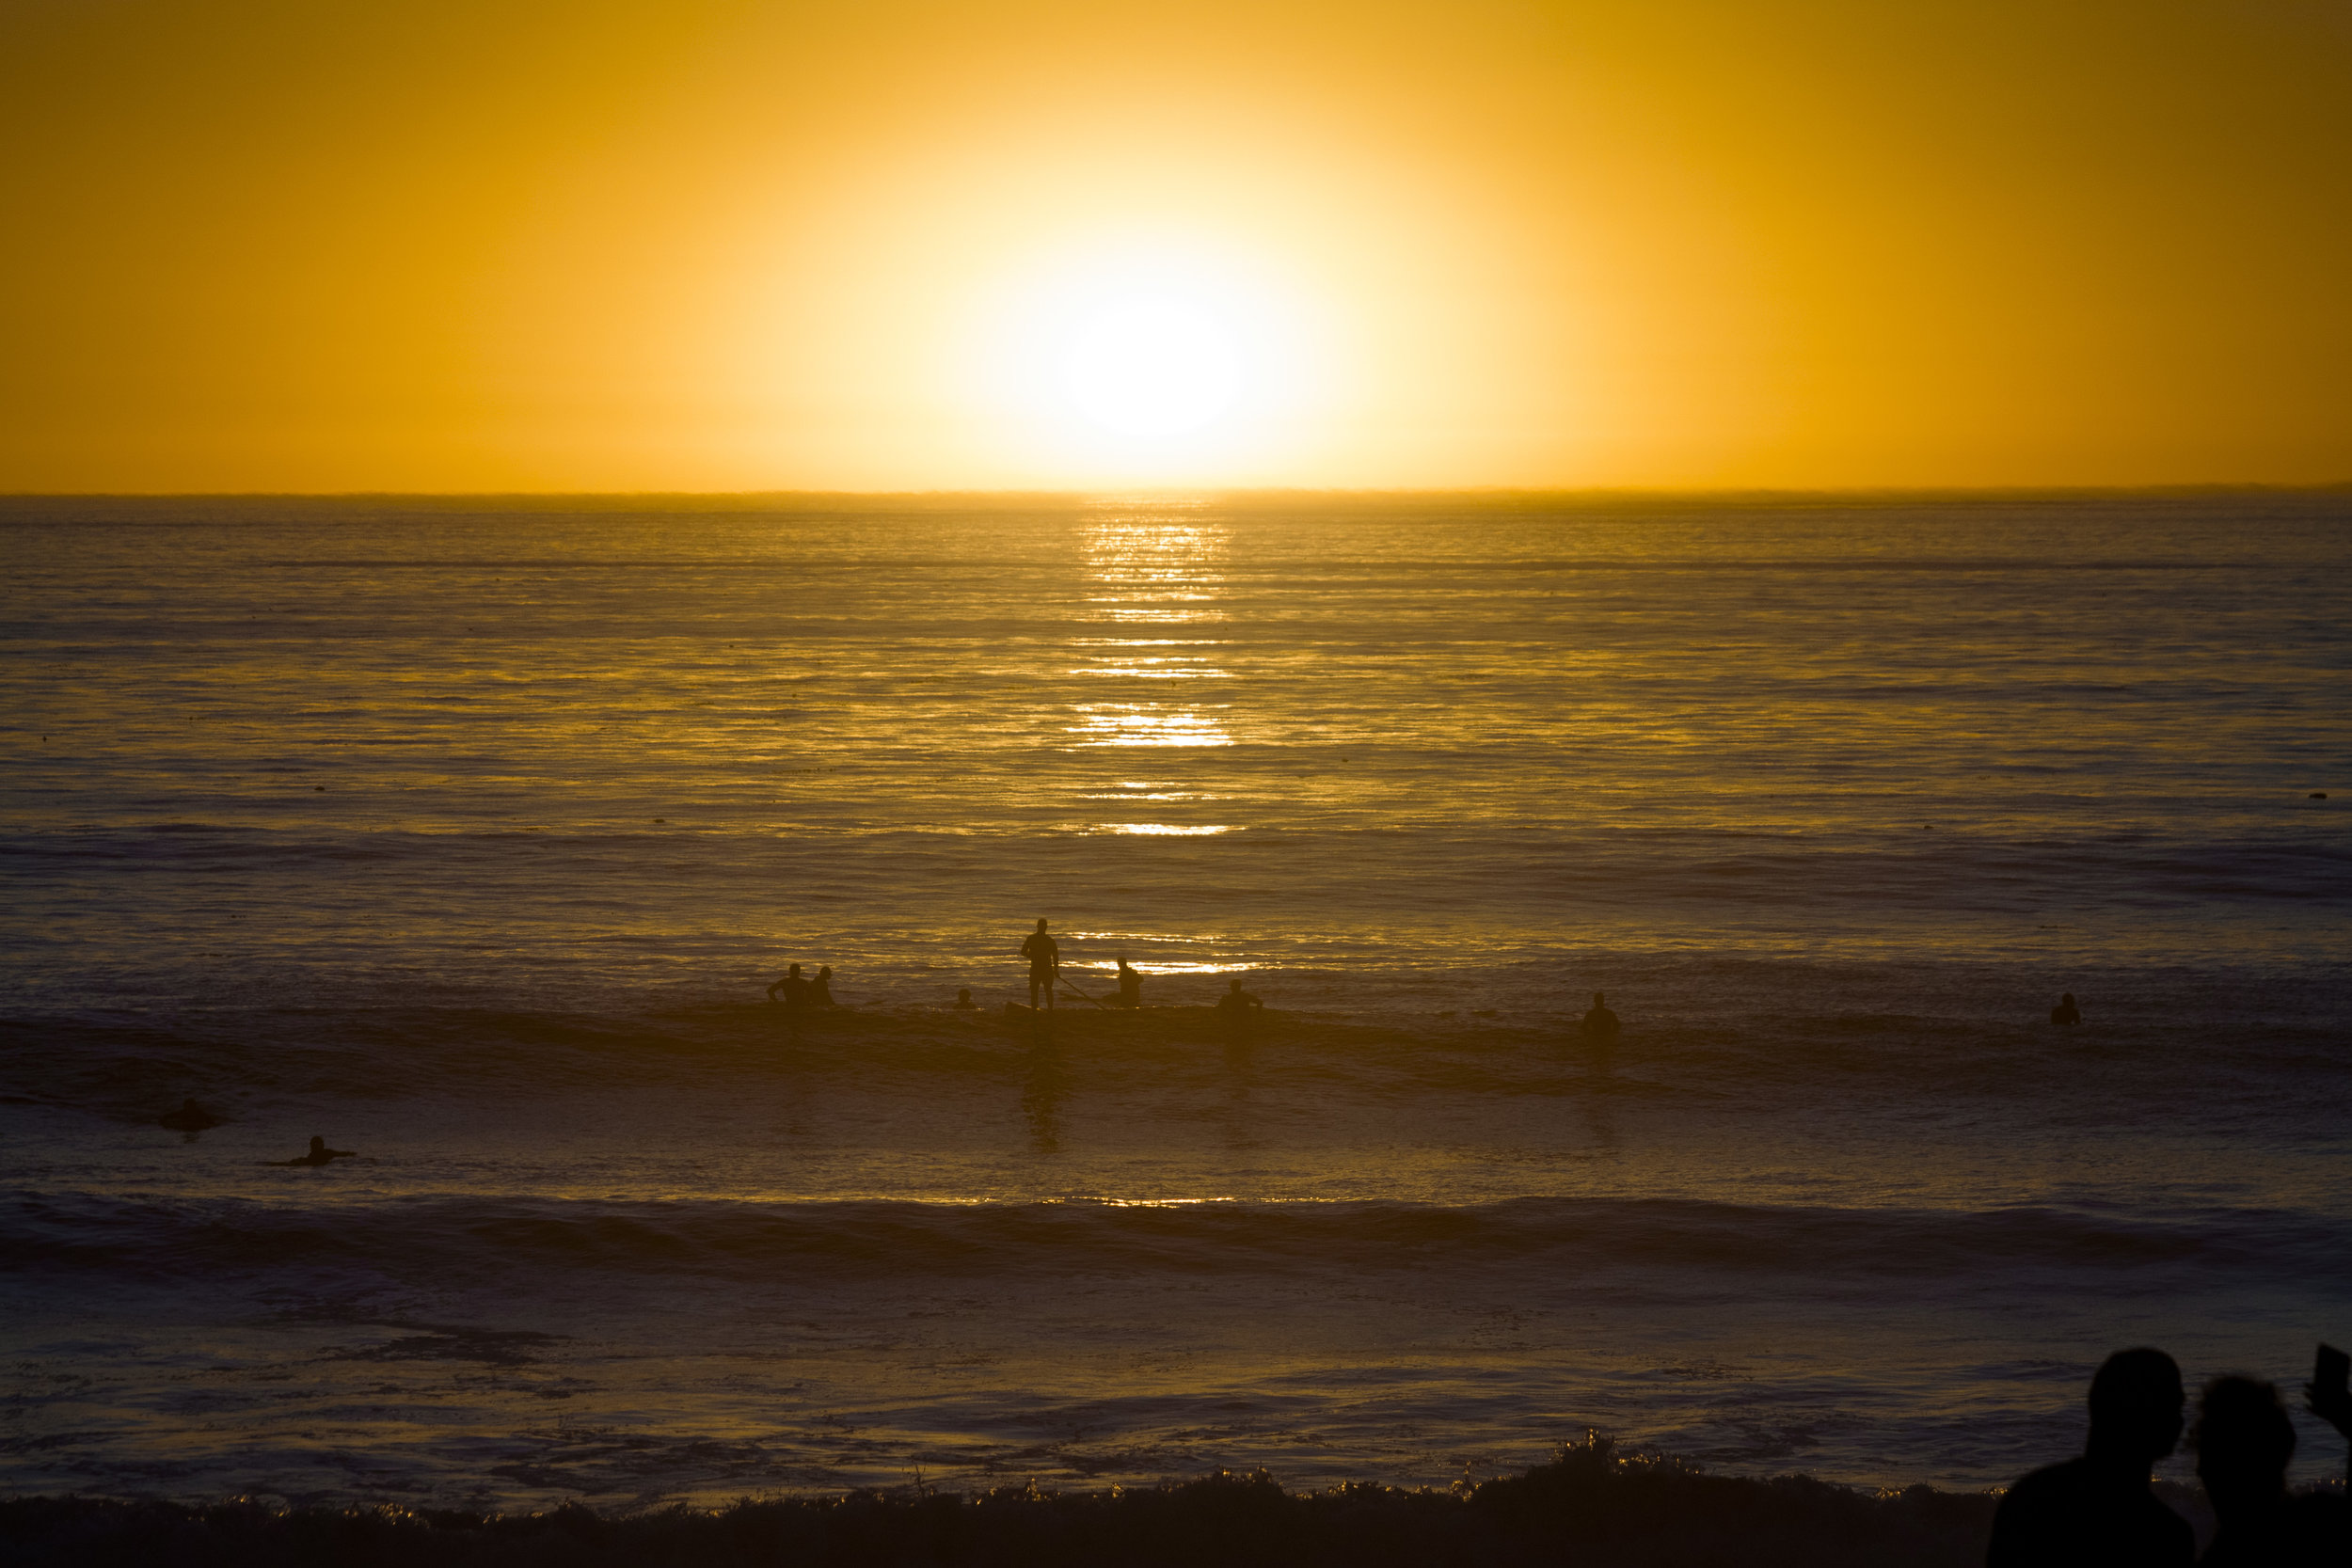 Surfers at Sunset Cliffs_GFTG.JPG